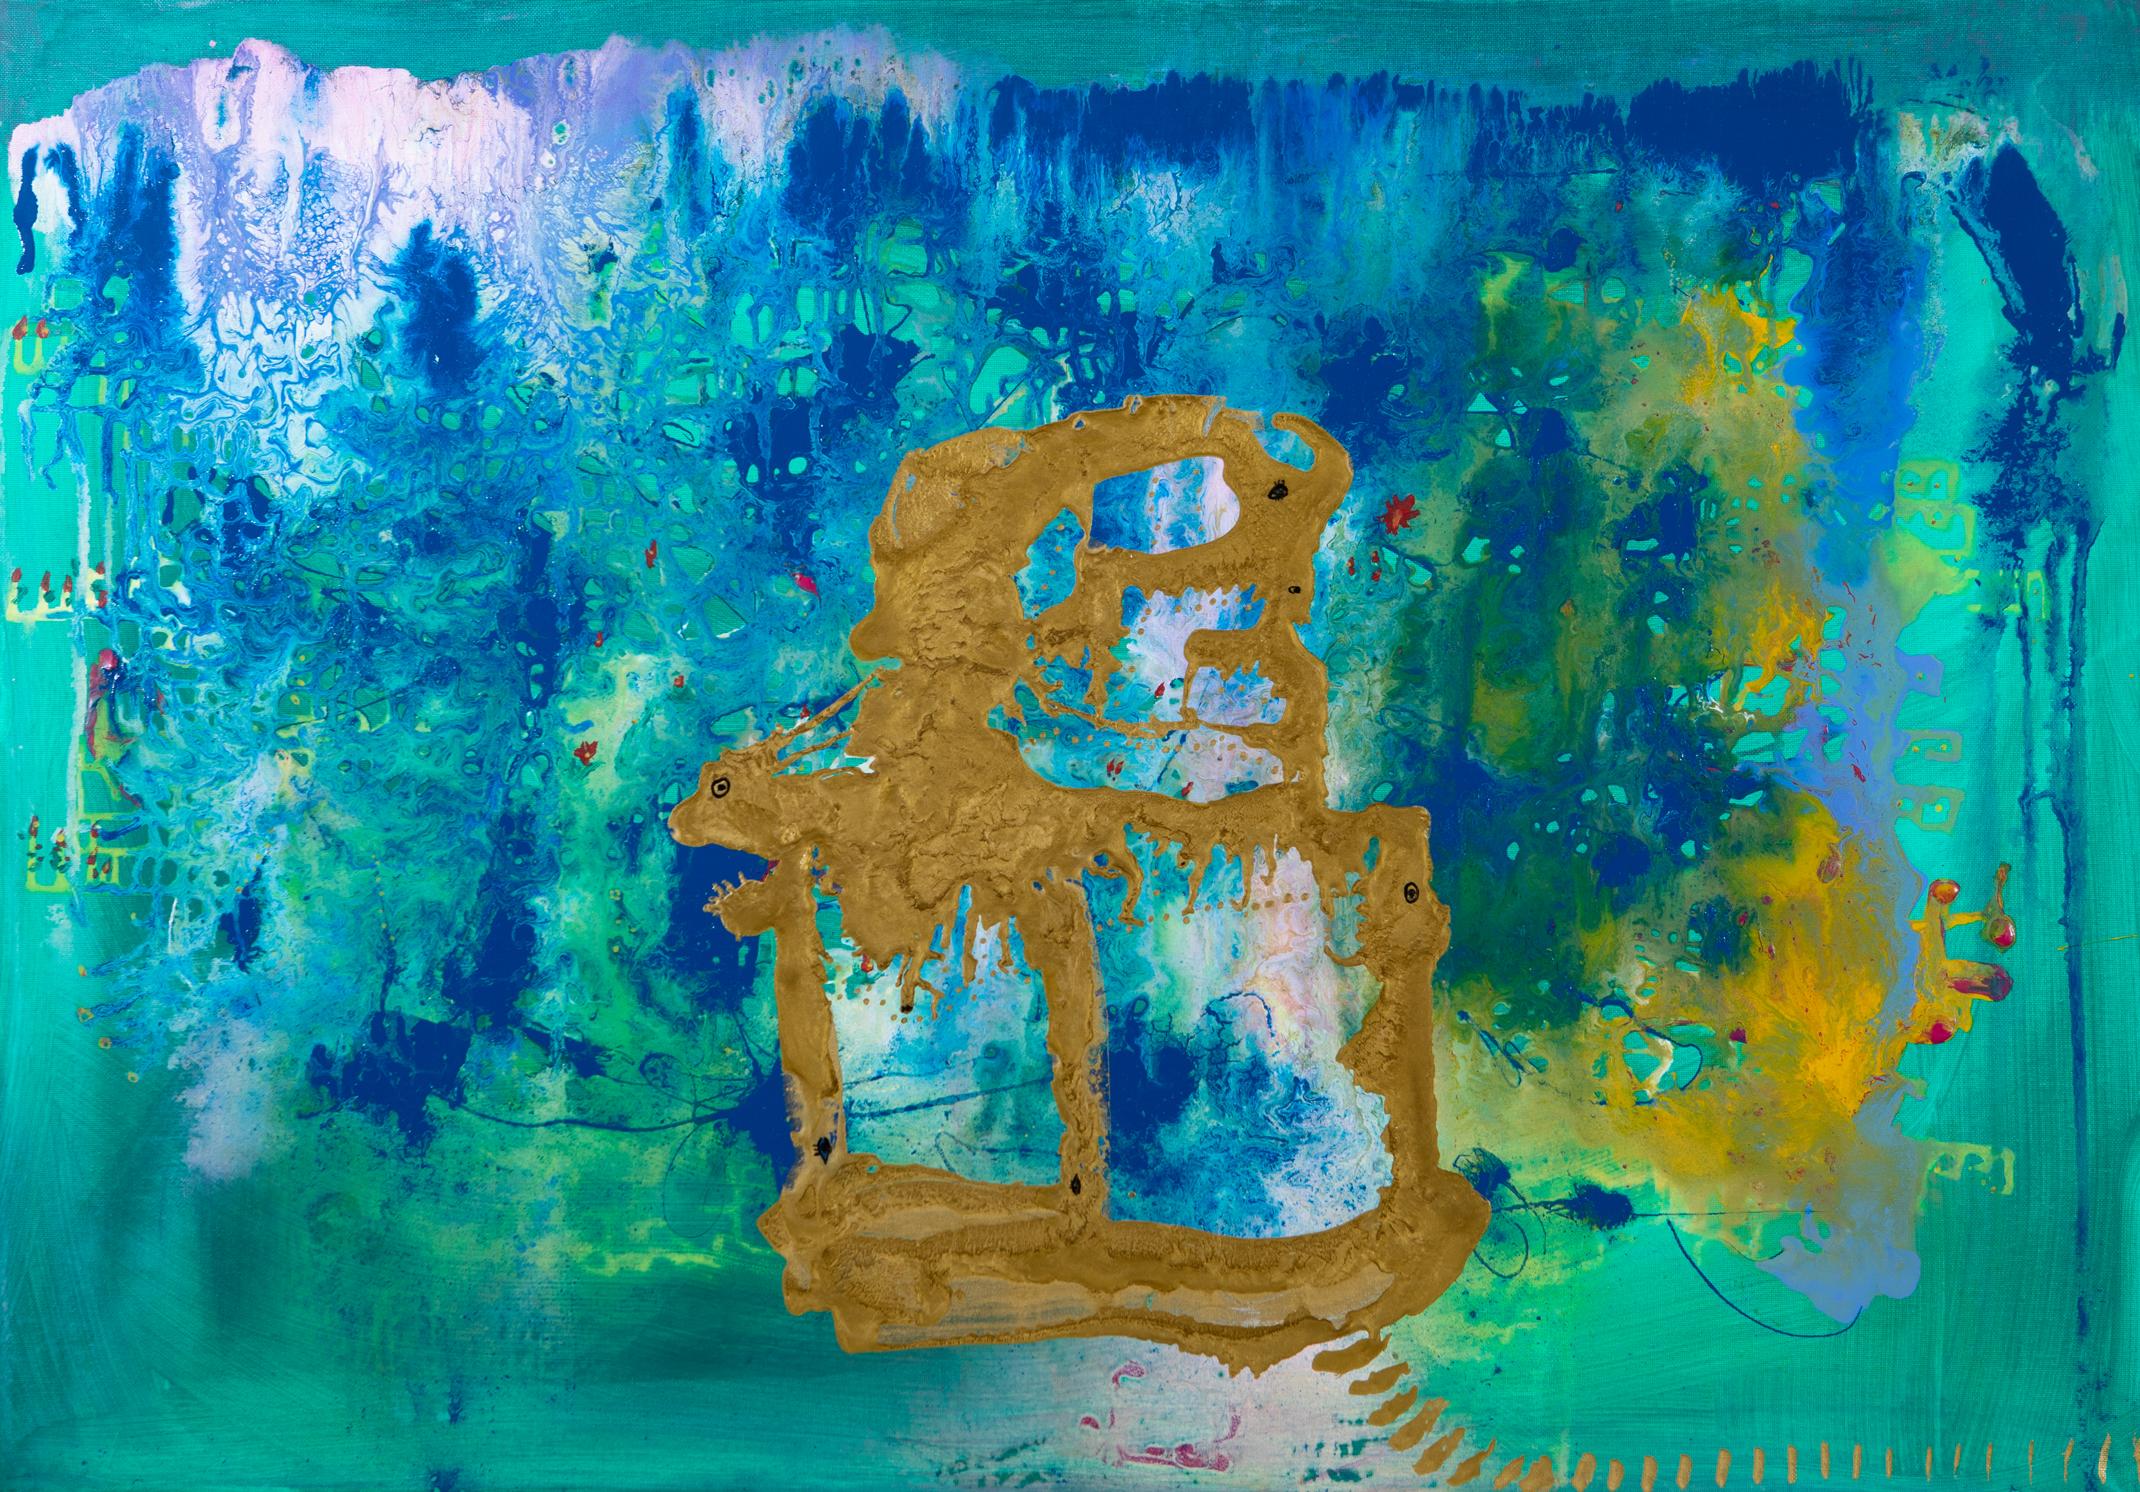 Goldener Palast - 2017Acryl auf Leinwand70 x 100 cm